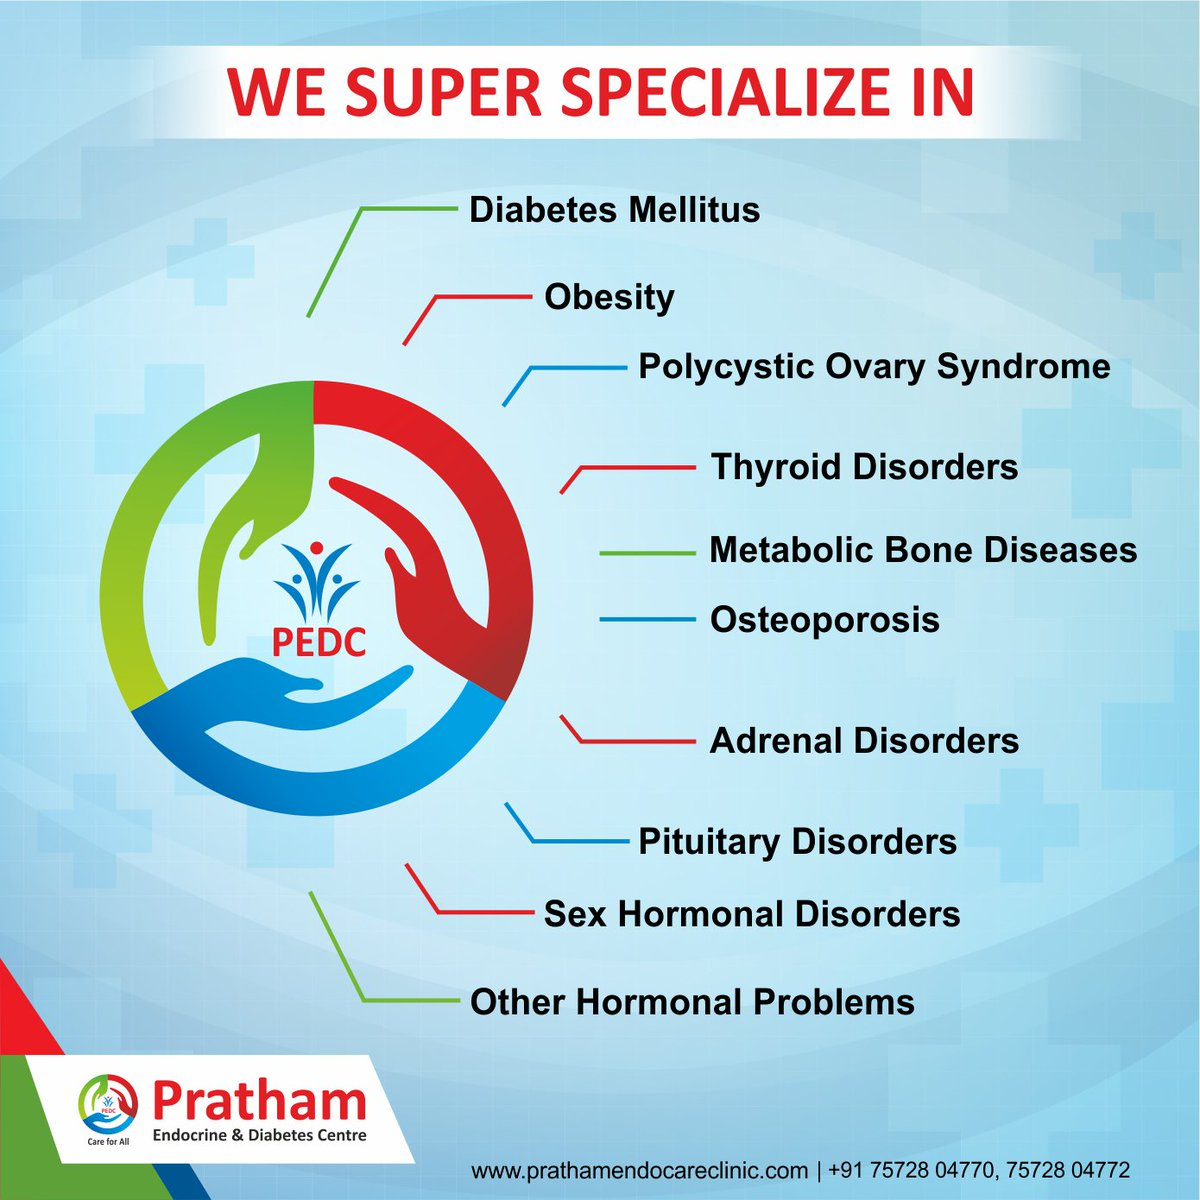 Pratham Endocrine & Diabetes Centre (@DrPradipDalwadi) | Twitter